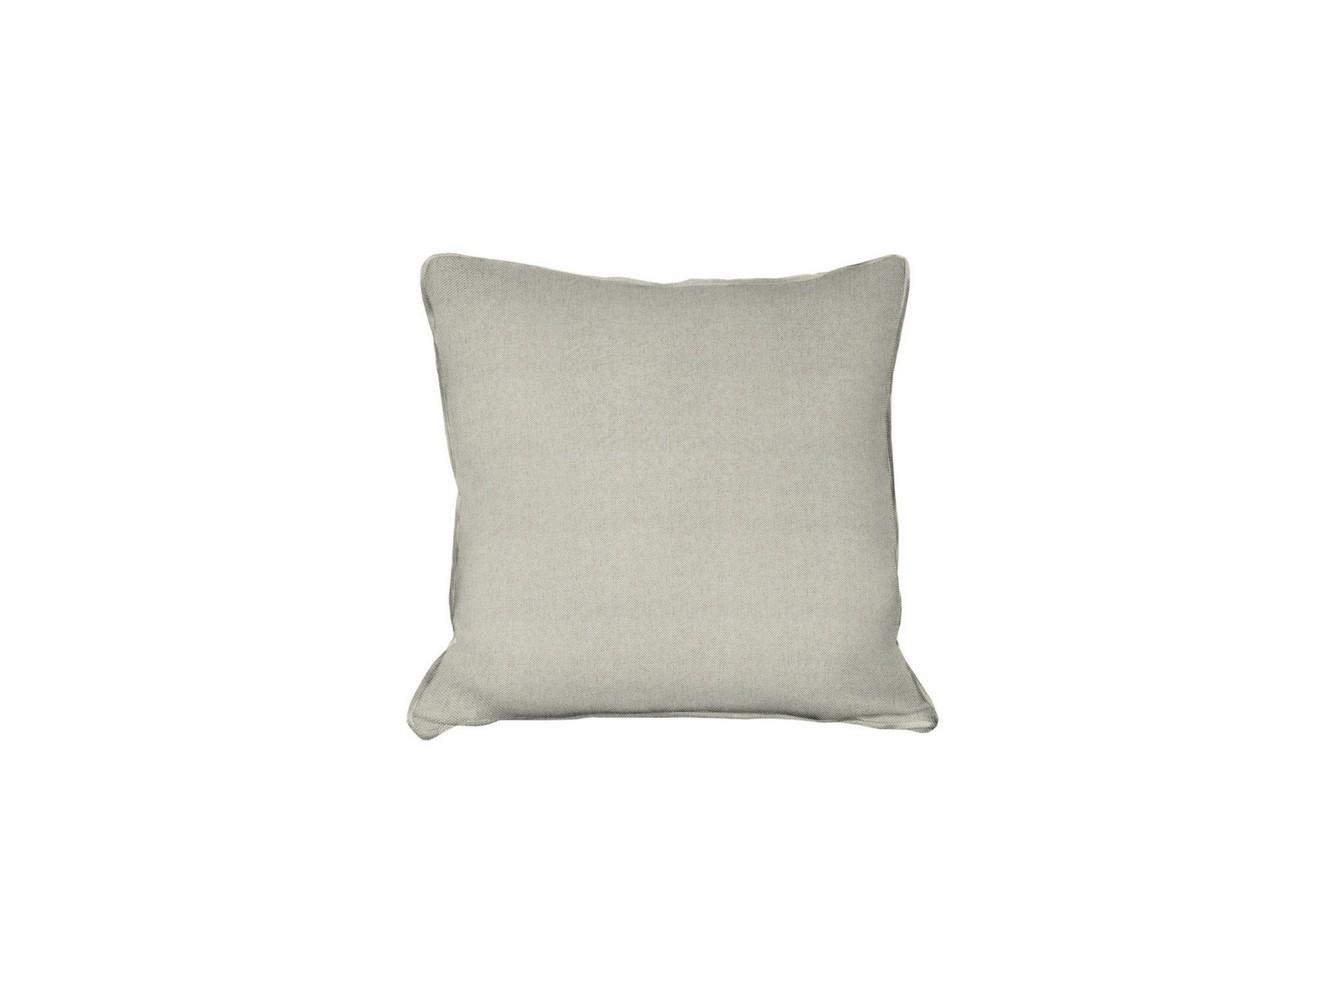 Extra Scatter Cushions - Fabric Cornsilk